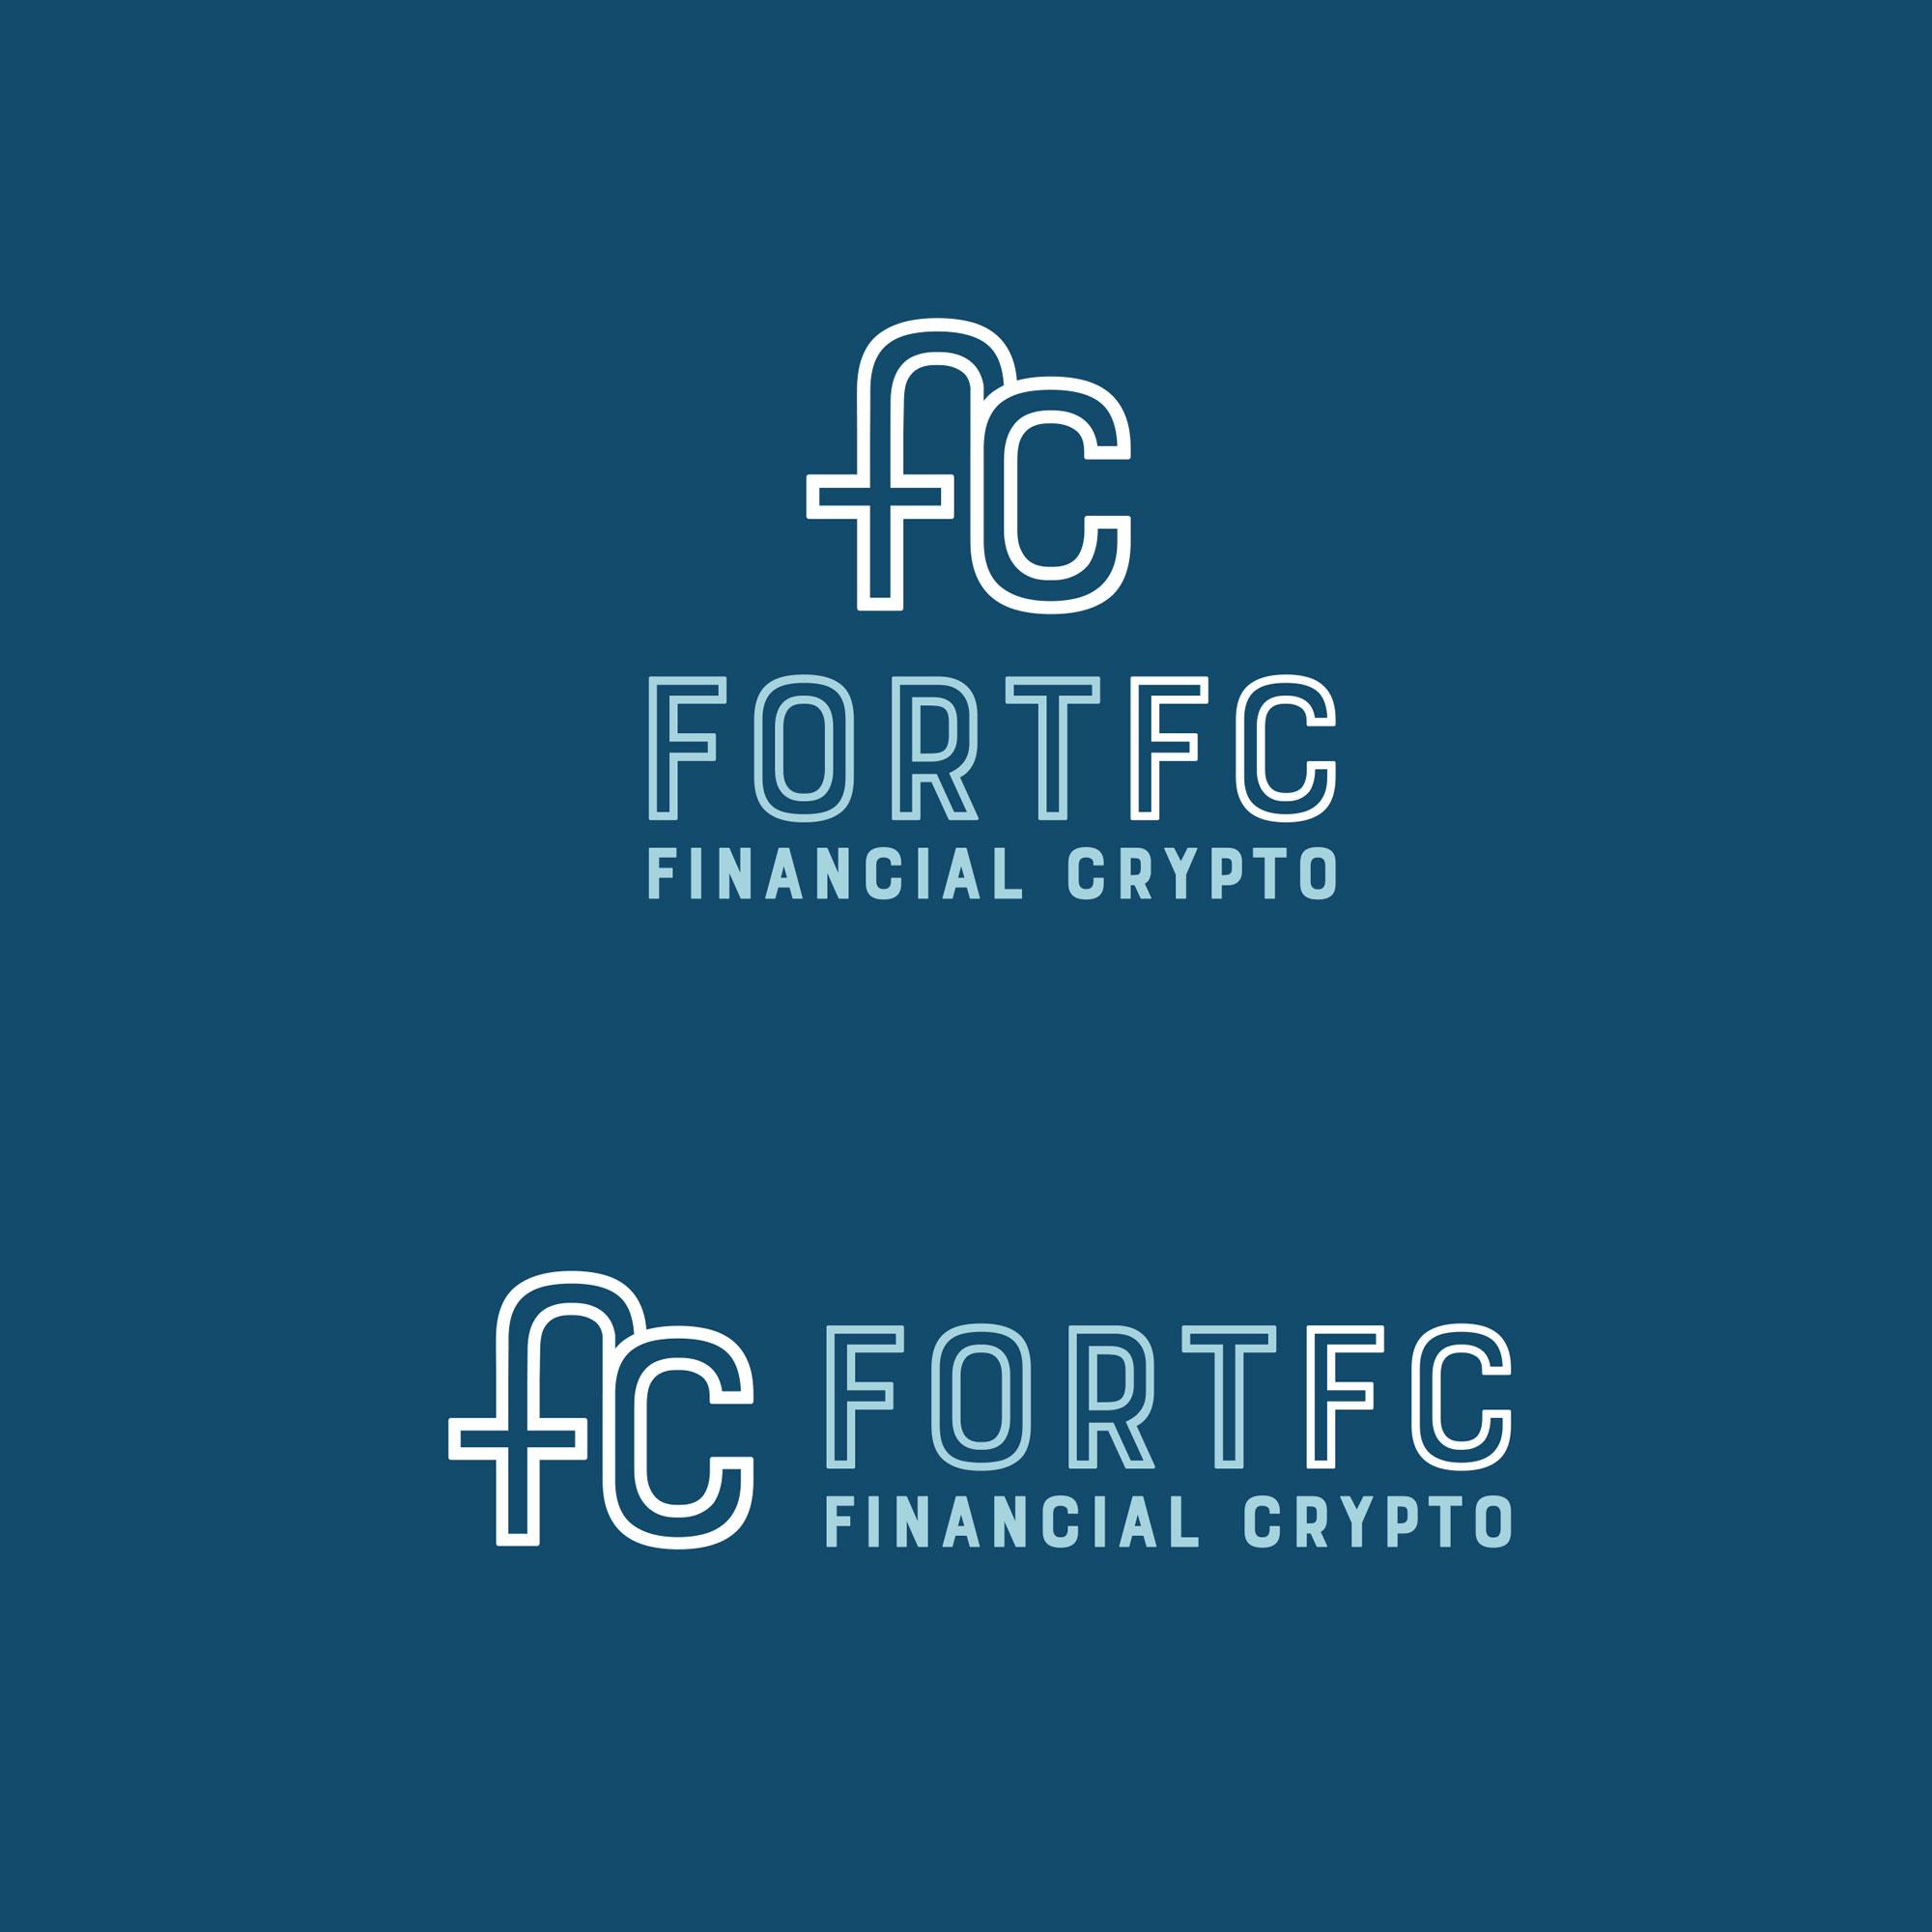 Разработка логотипа финансовой компании фото f_5905a83e25bd1728.jpg